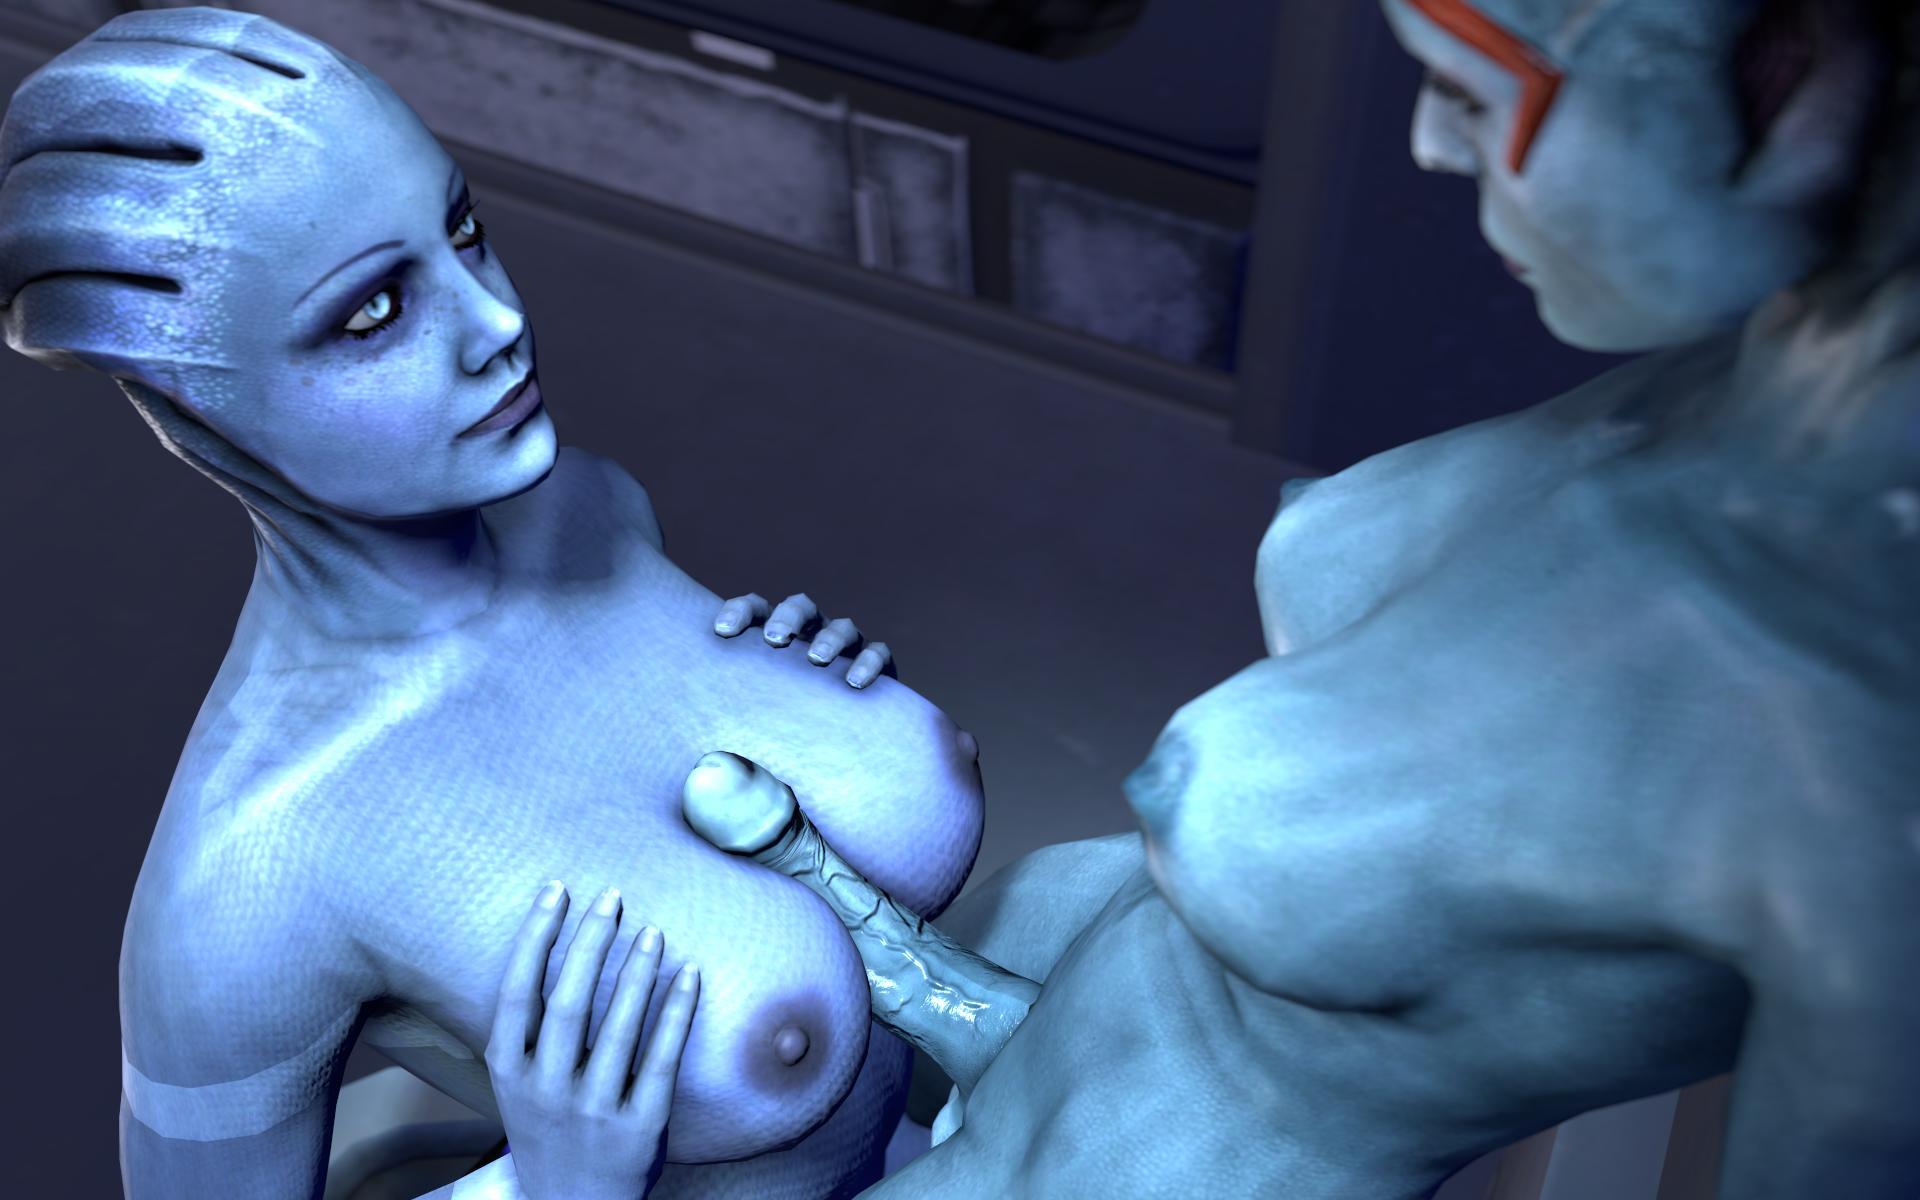 Mass Effect Liara Miranda